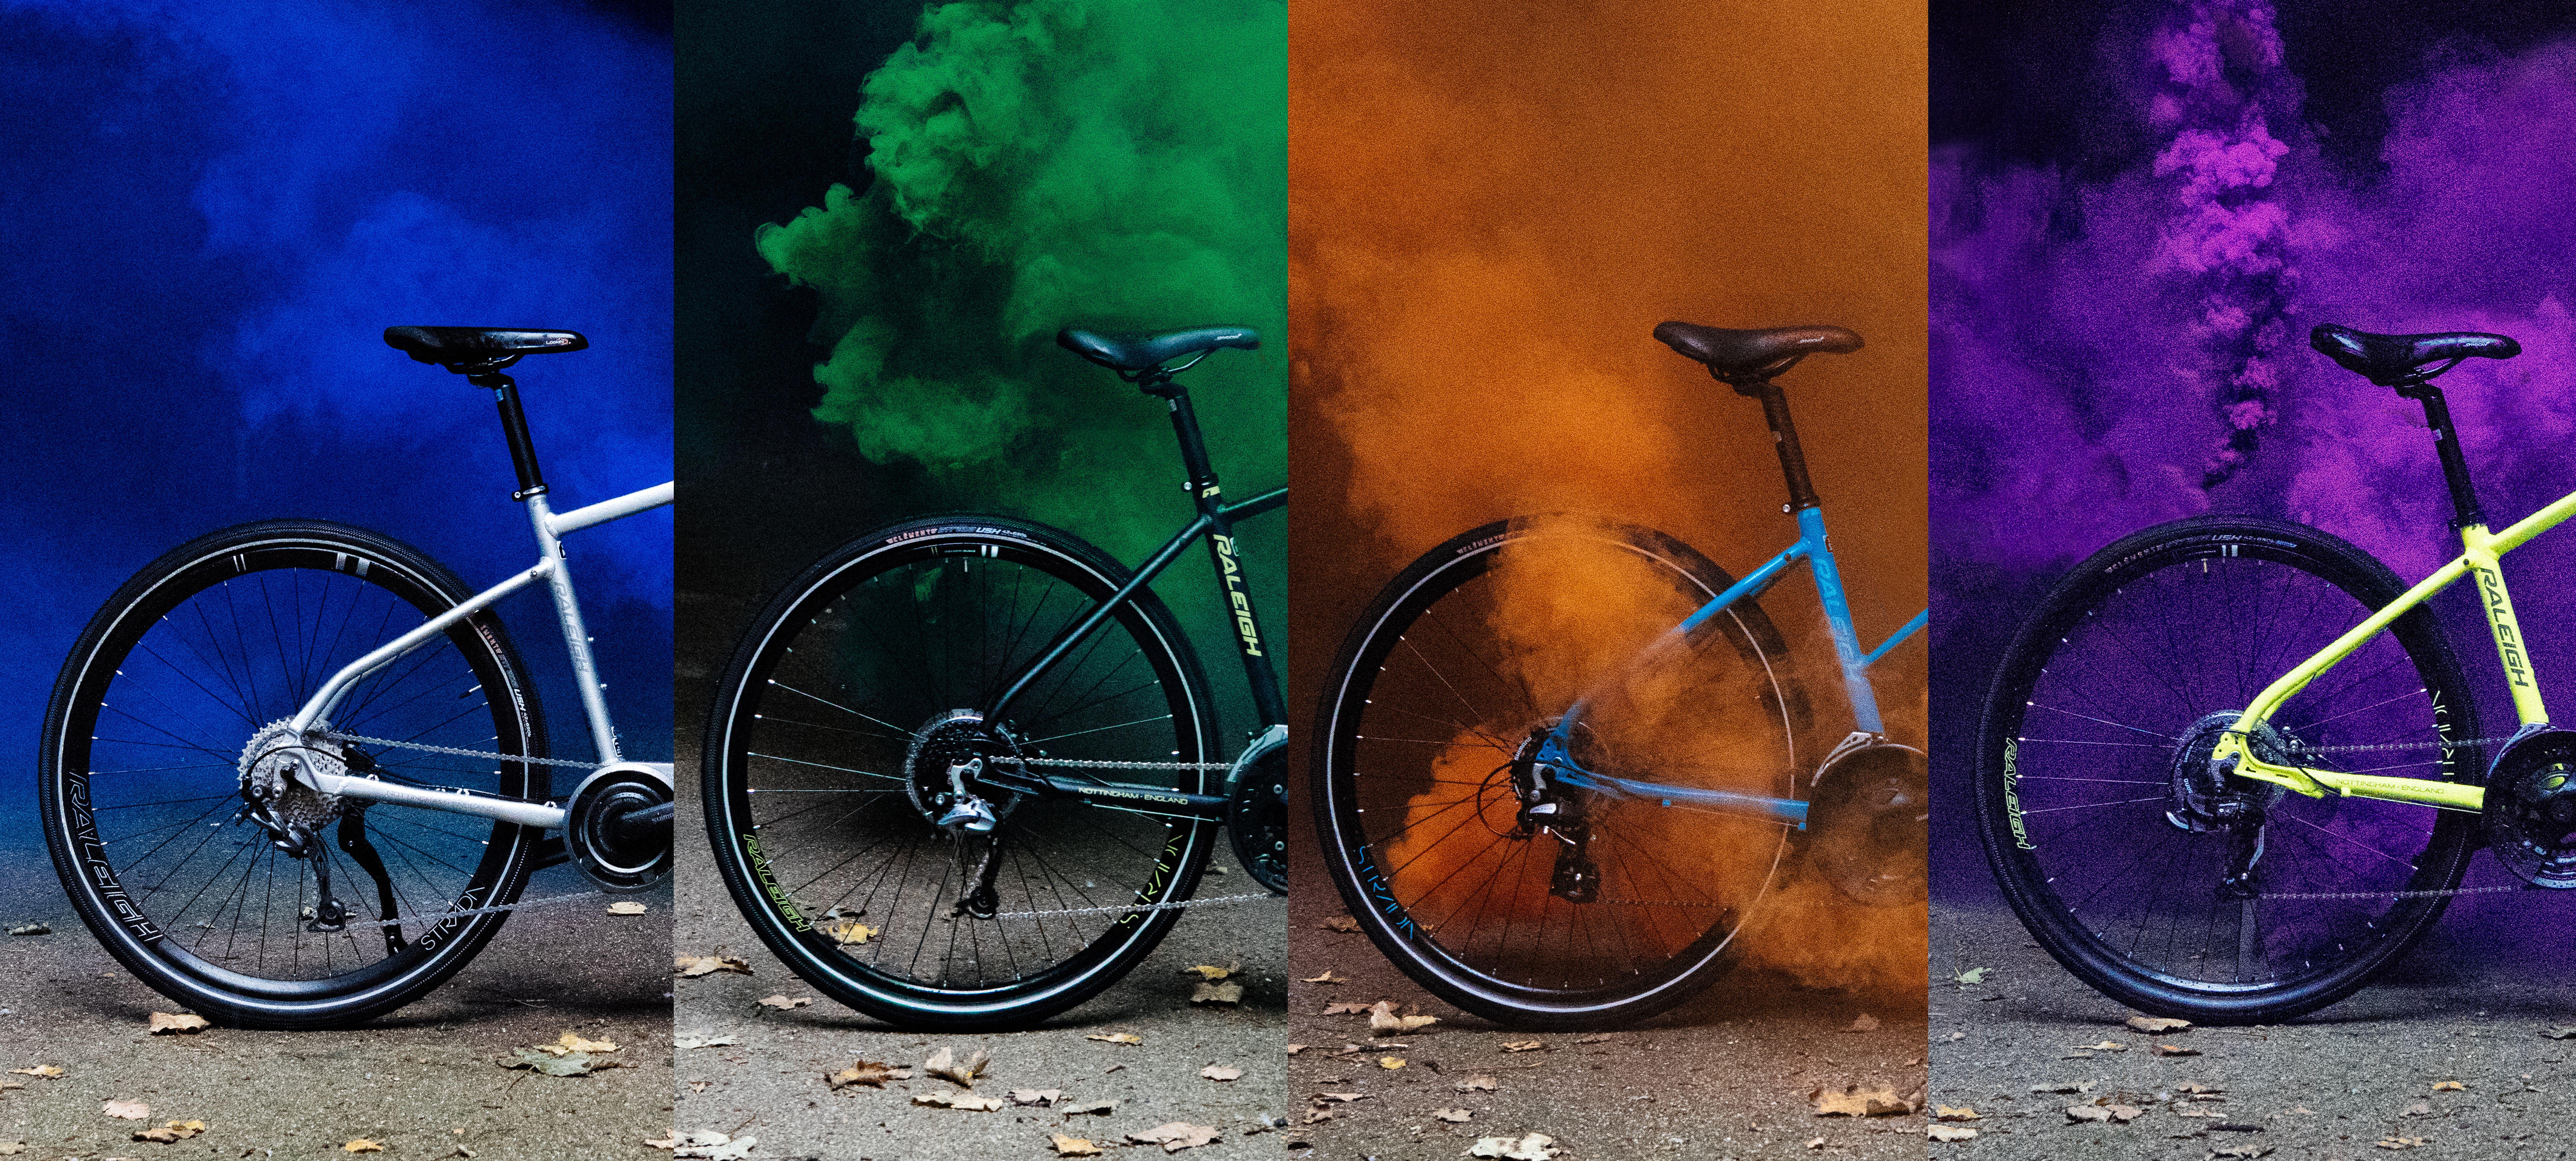 650b Vs 700c Bicycle Wheel Tyre Size Comparison Raleigh Uk Bicycle Wheel Adventure Bike Wheel